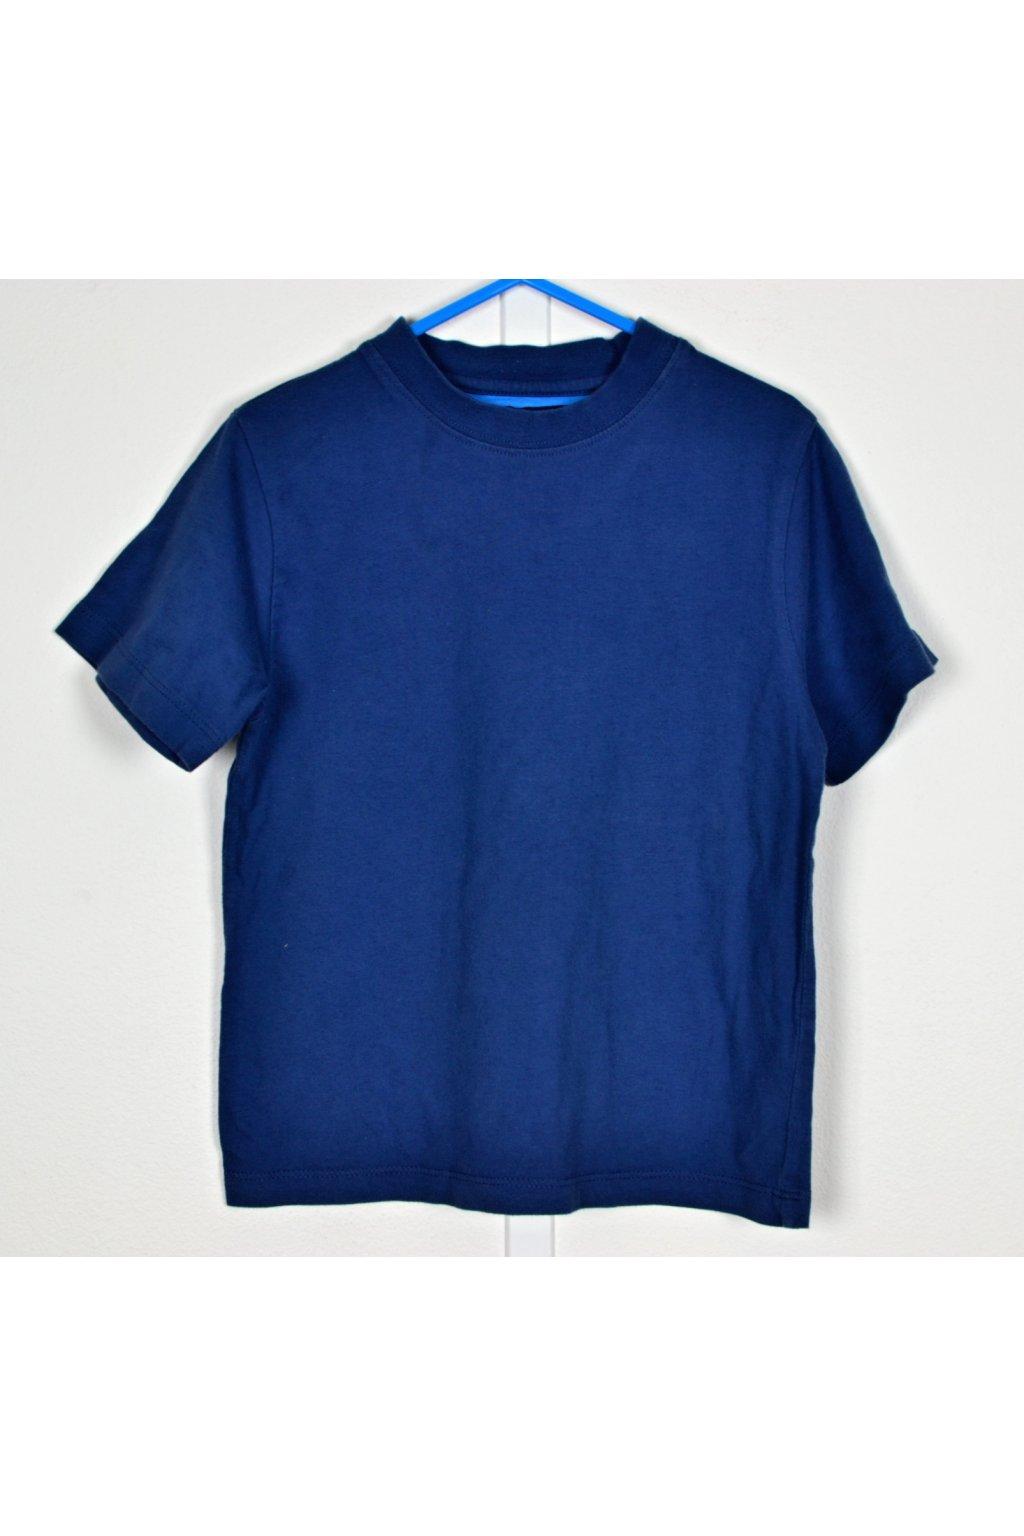 Tričko Red Herring vel 3-4/104 modré krátký r